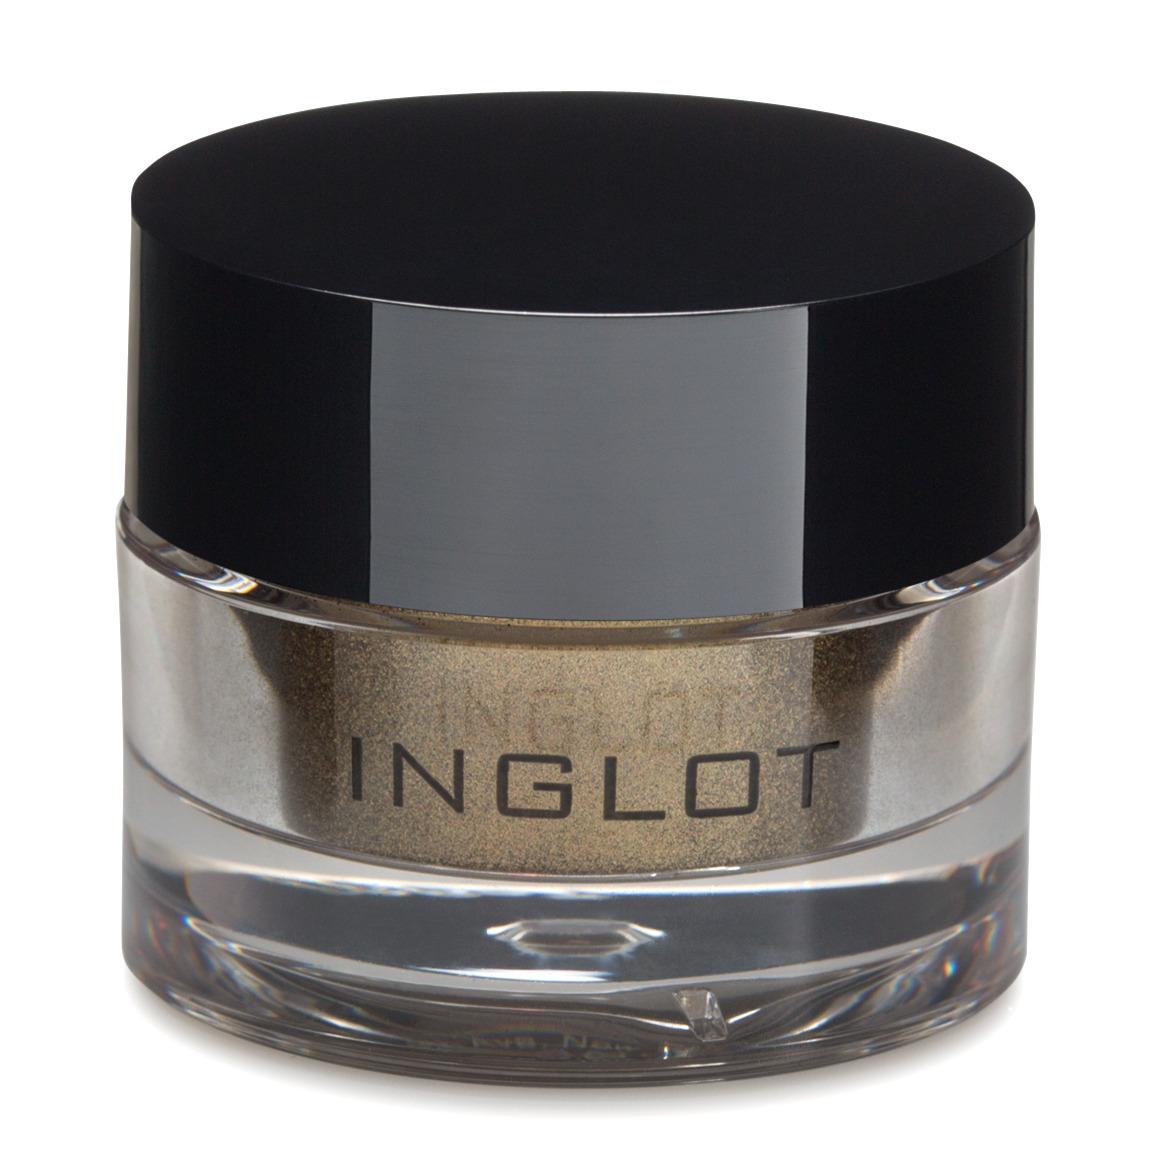 Inglot Cosmetics AMC Pure Pigment Eye Shadow 84